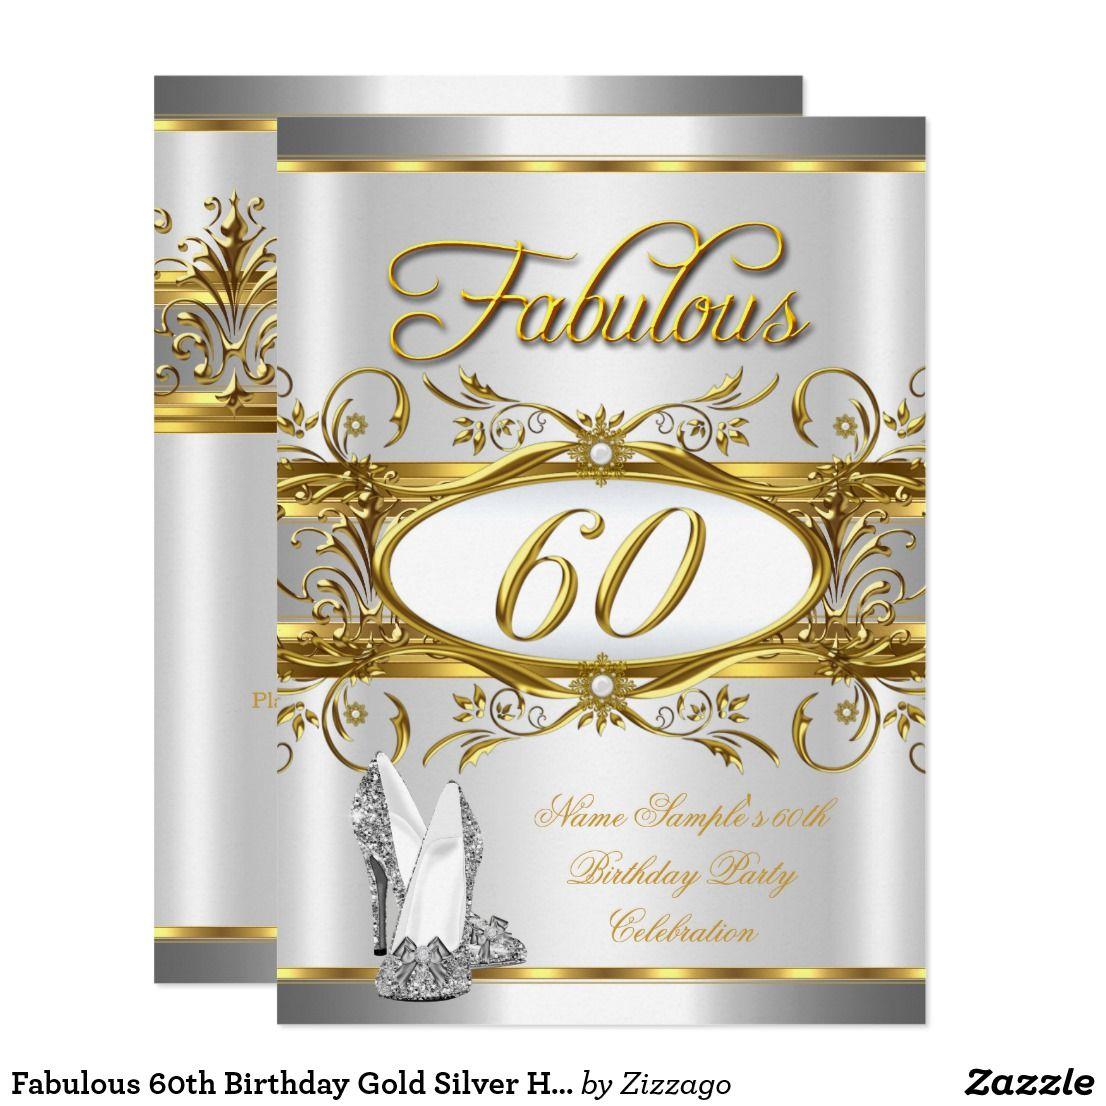 Fabulous 60th Birthday Gold Silver High Heels 60 Invitation ...